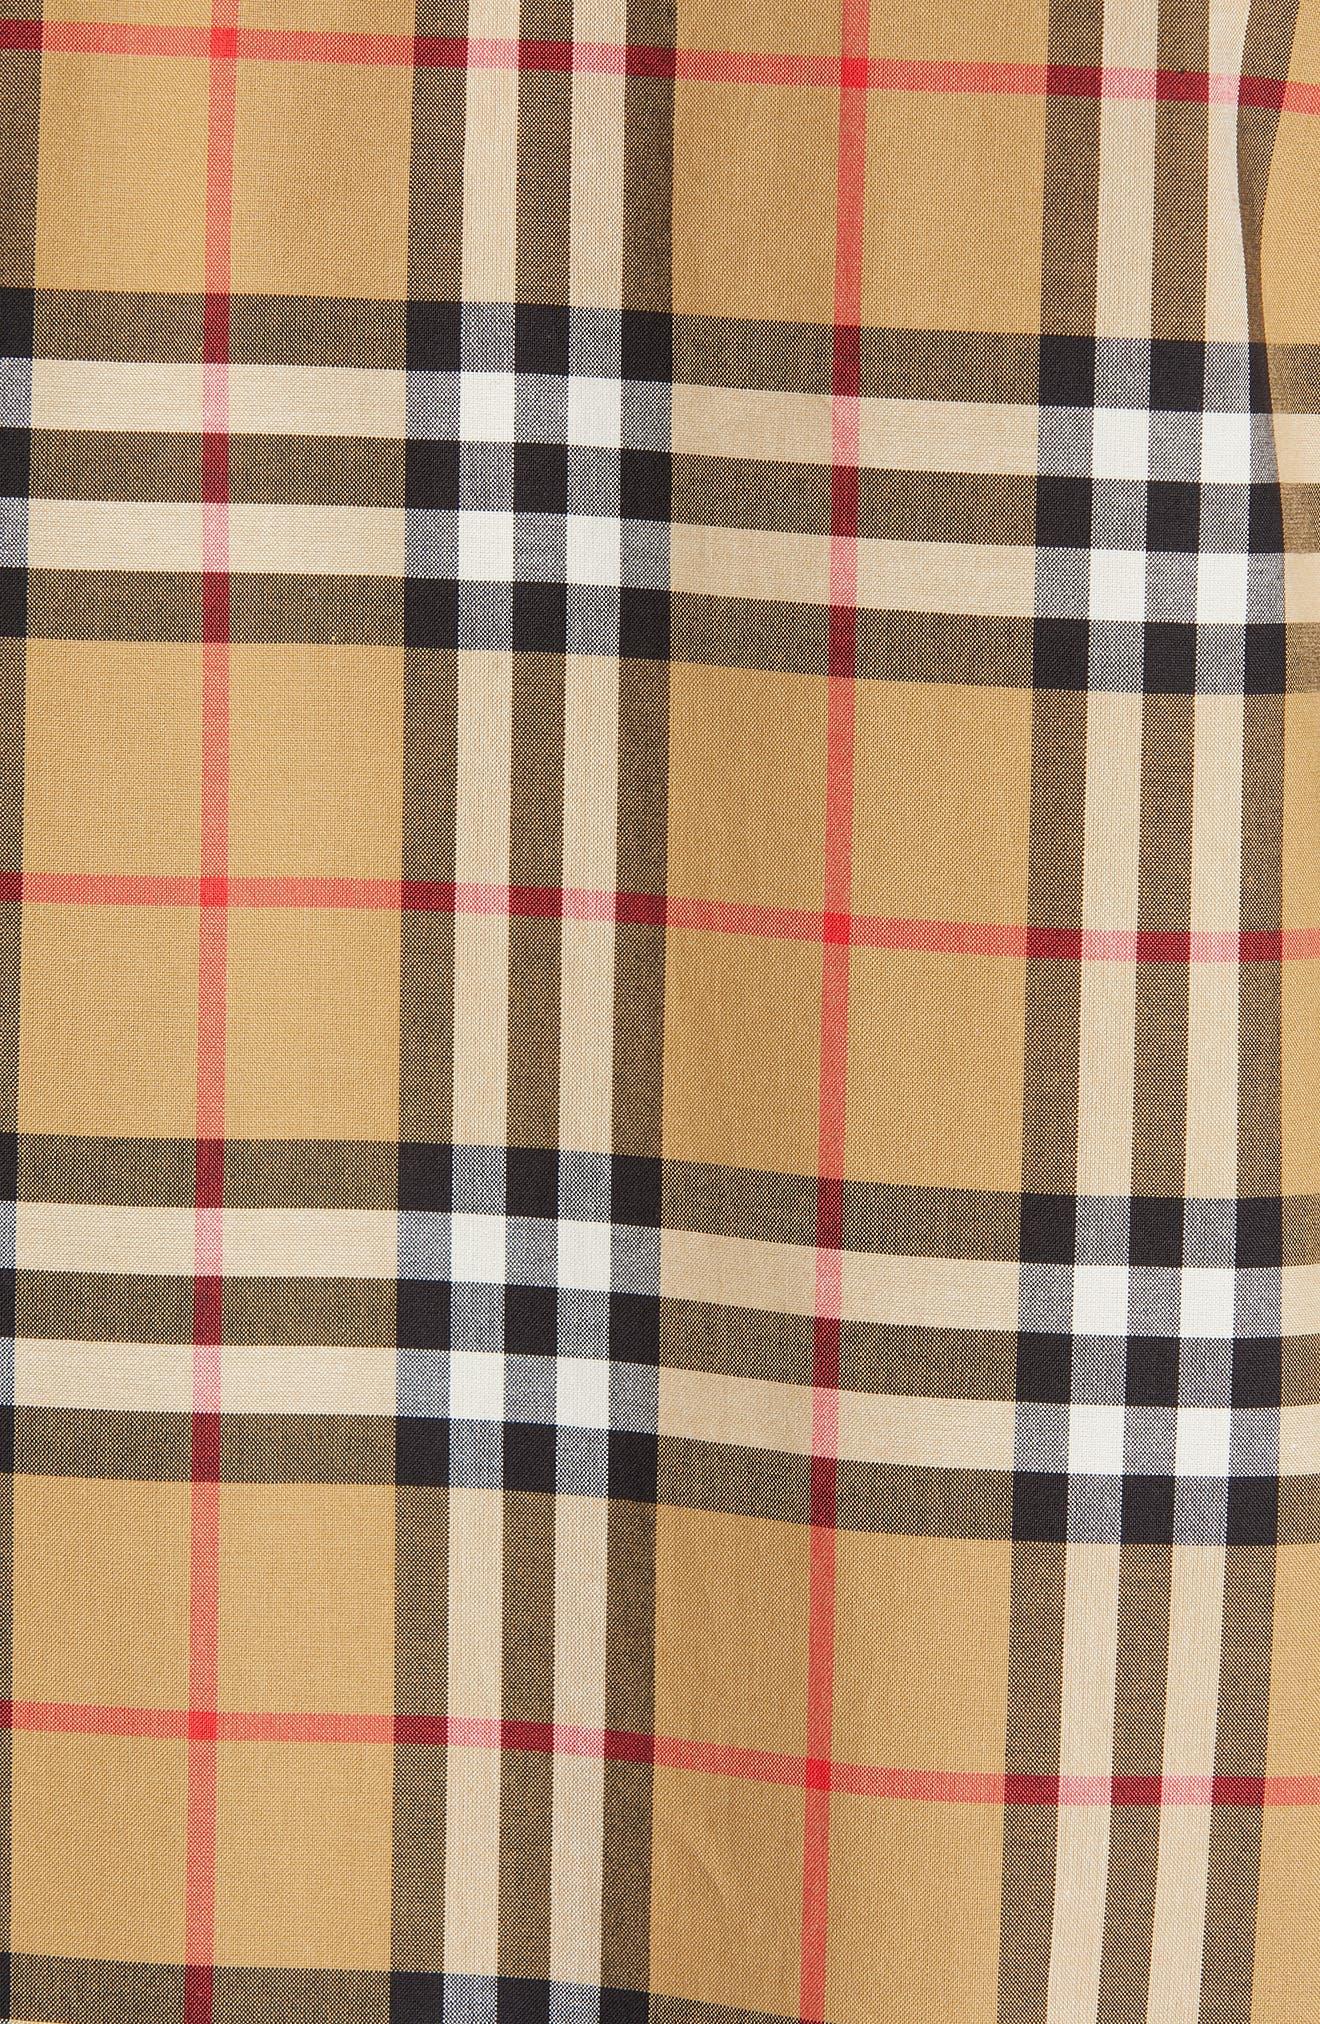 BURBERRY, Saoirse Vintage Check Cotton Shirt, Alternate thumbnail 6, color, ANTIQUE YELLOW CHECK